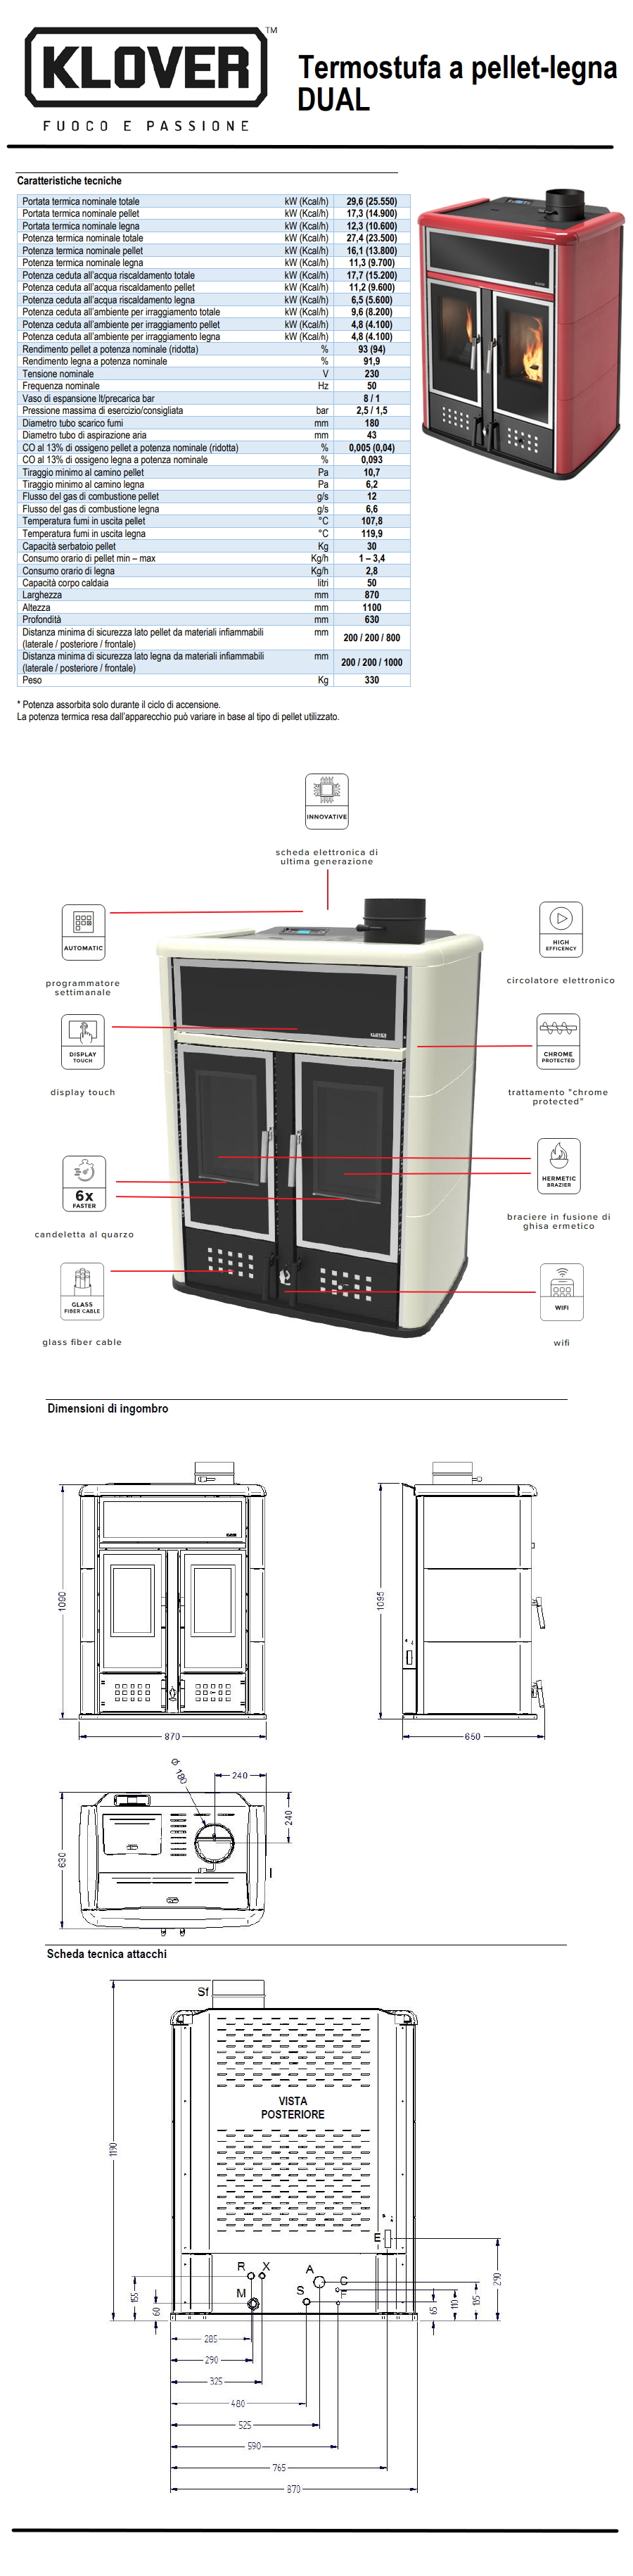 Stufa a pellet e legna klover dual acs 27 4 kw idro kit for Mito idro edilkamin scheda tecnica